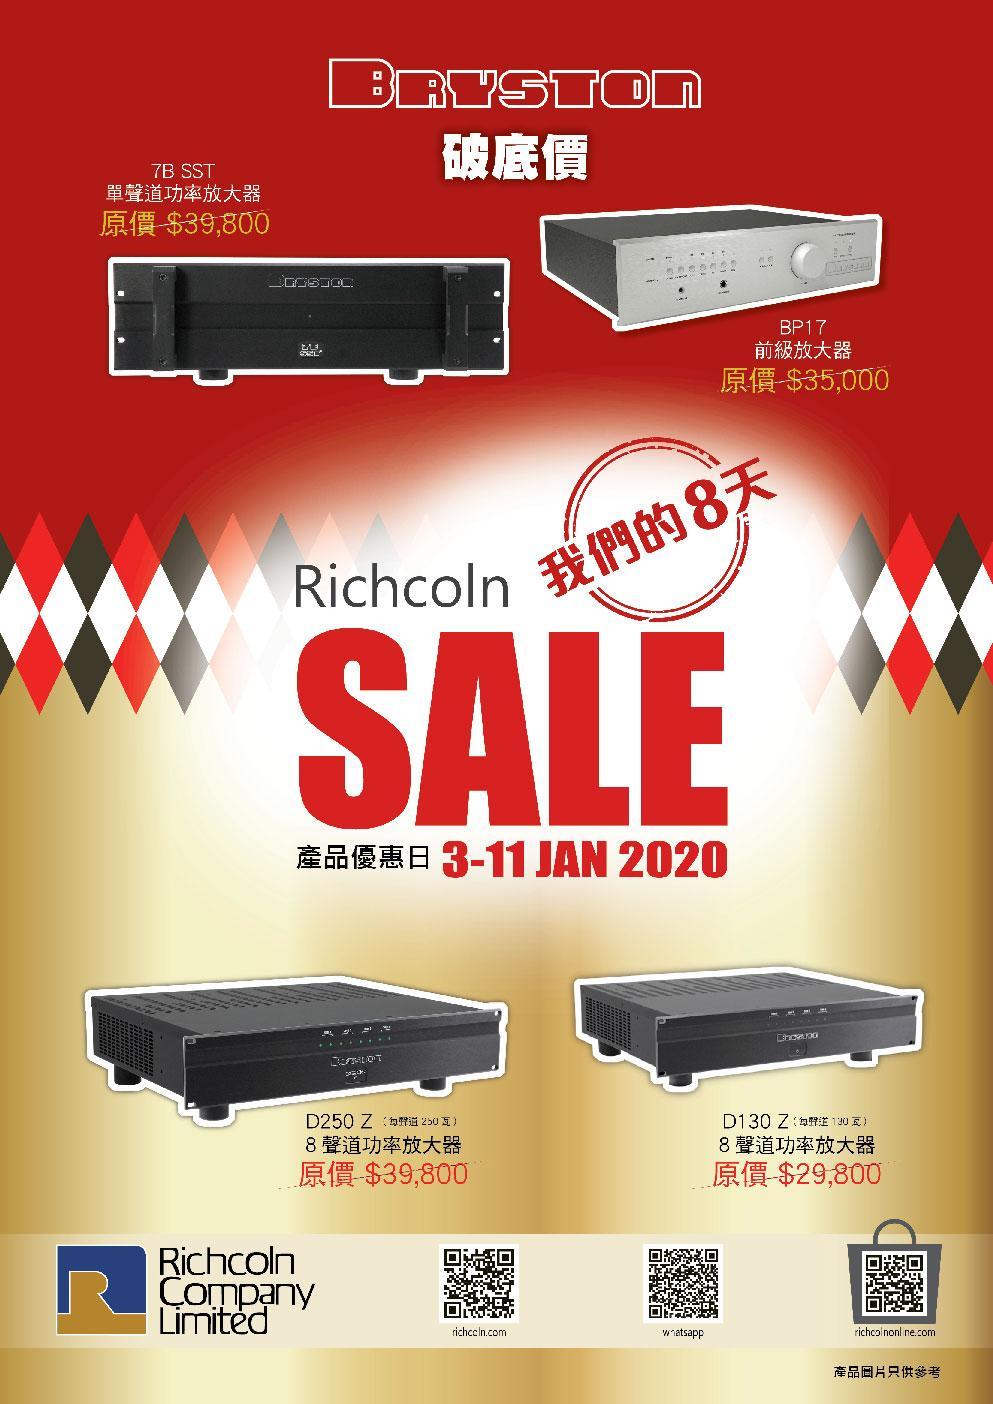 Richcoln 一年一度《我們的8天》減價大優惠